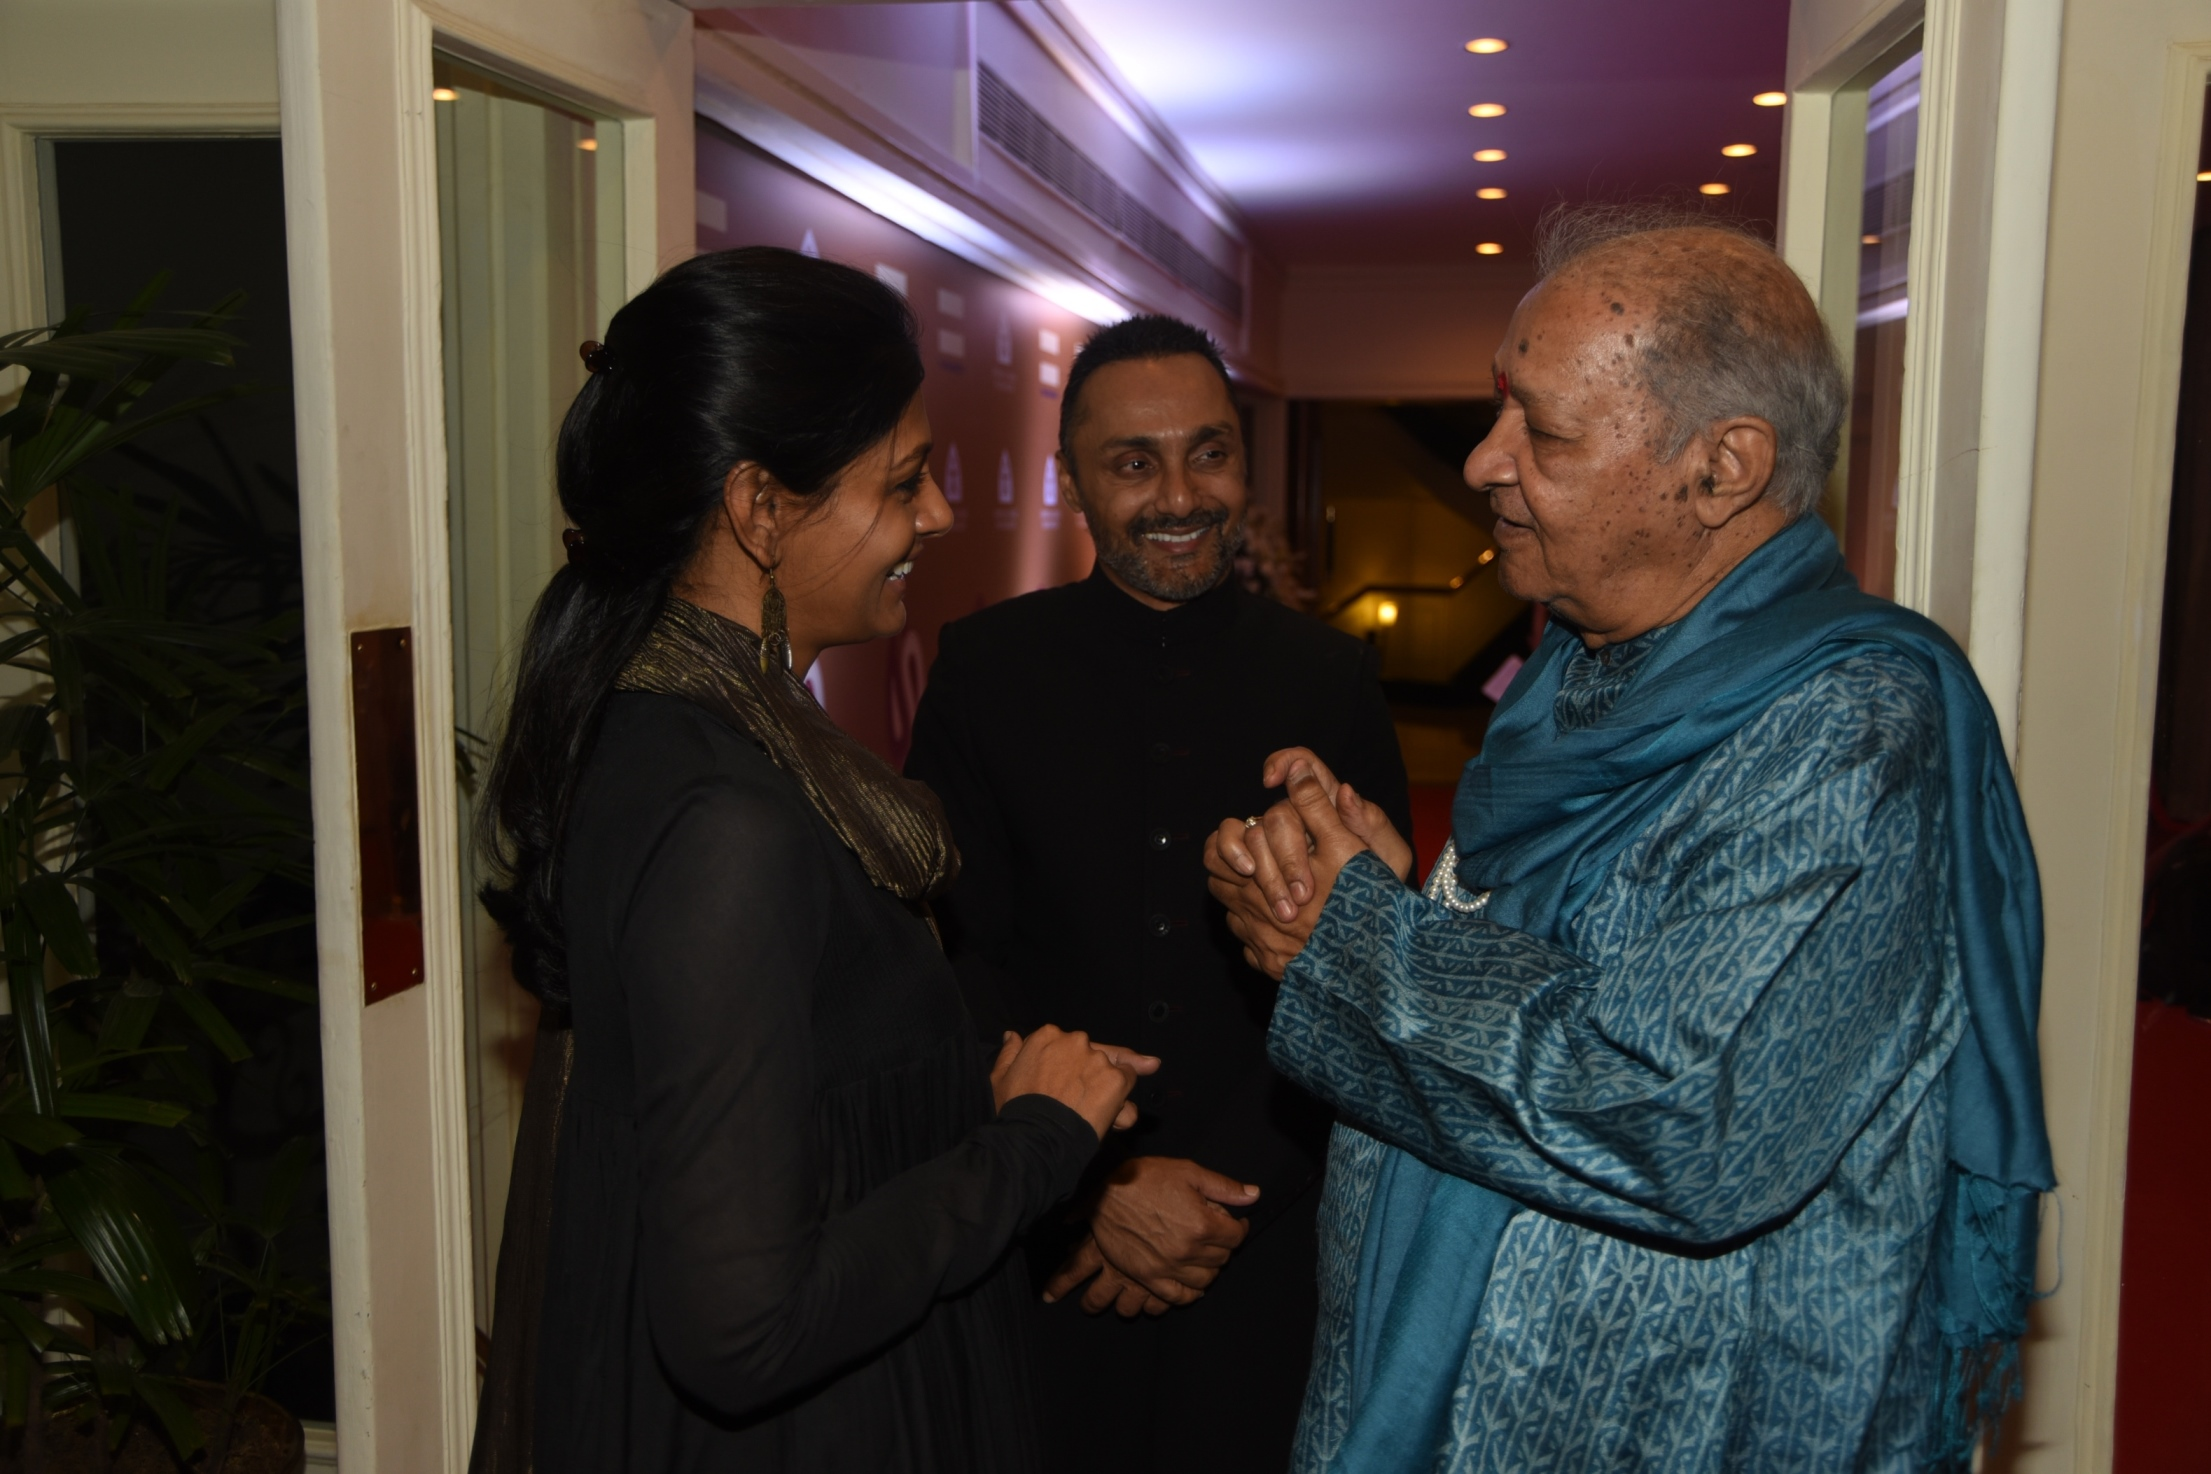 Nandita Das and Pt Hariprasad Chaurasiya chat as Rahul looks on